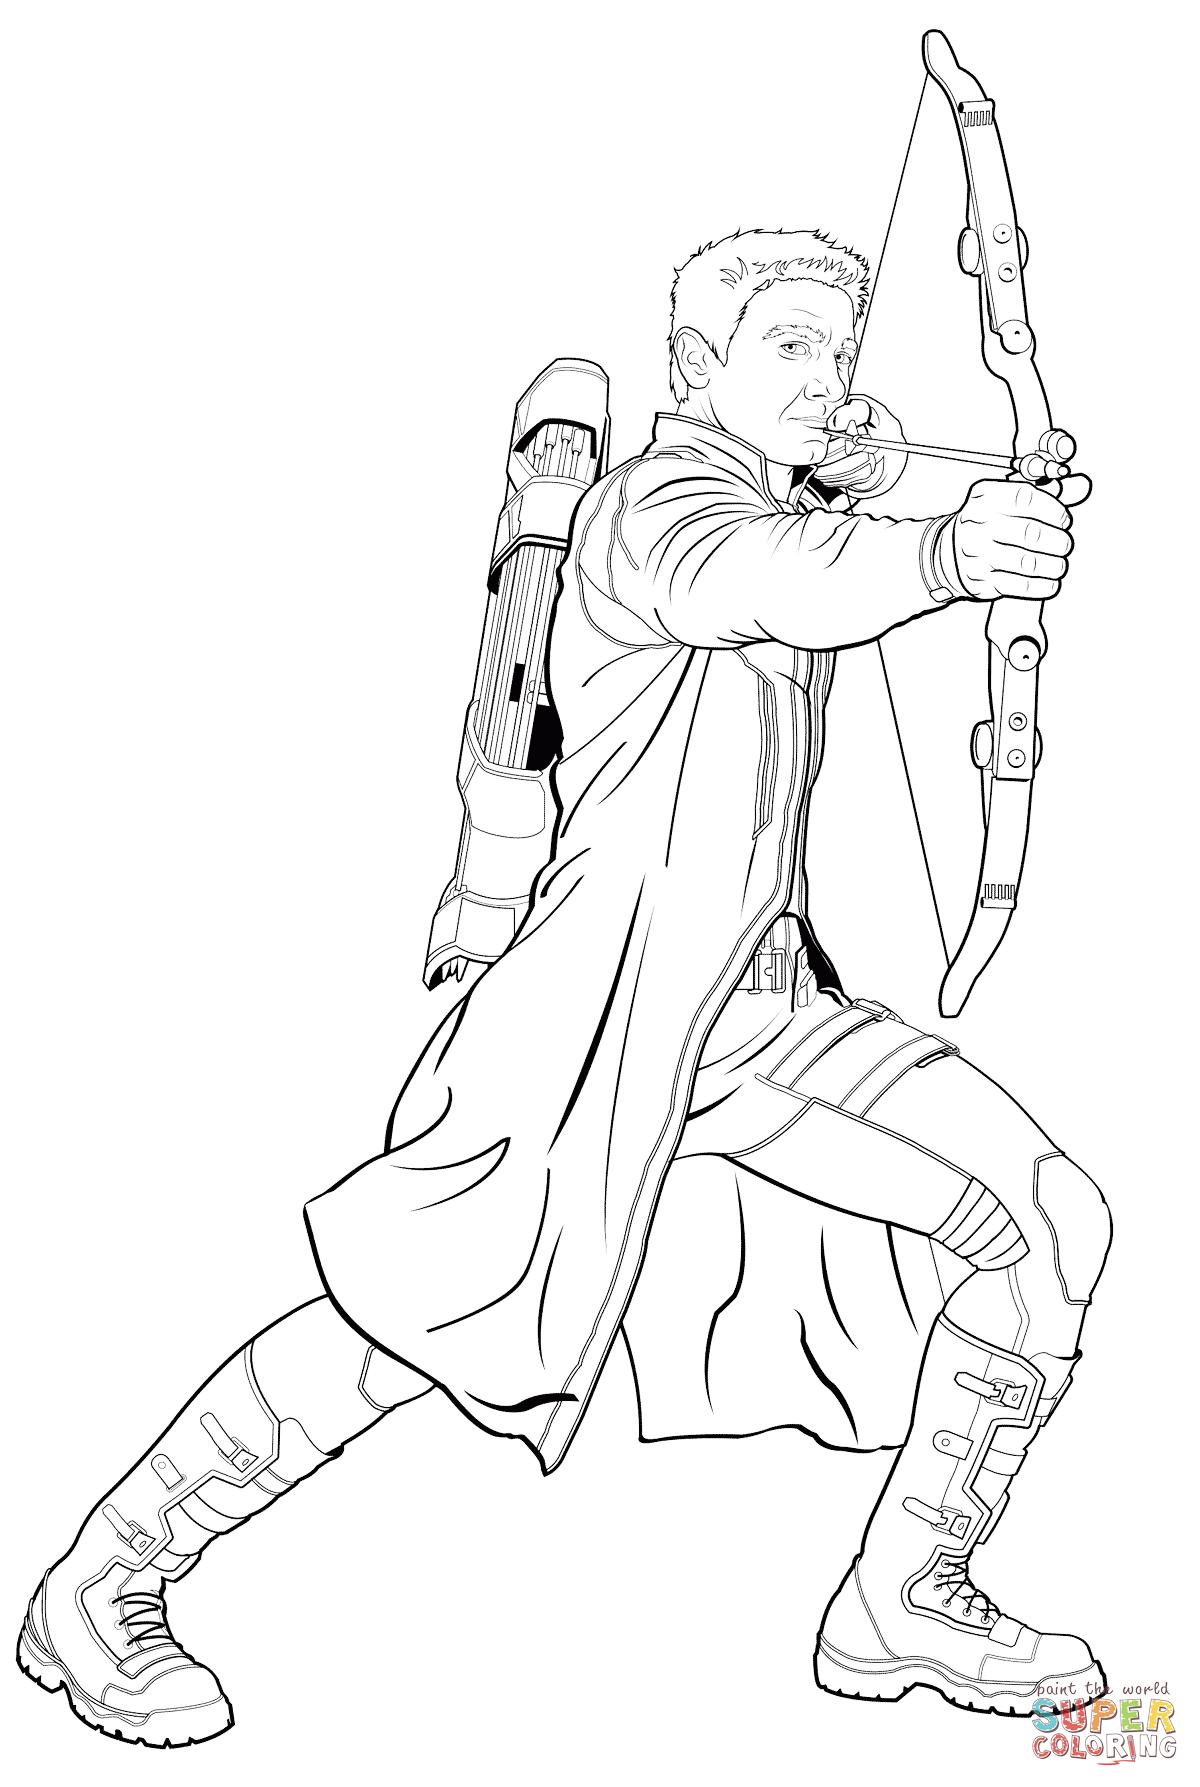 Dibujo de Avengers Hawkeye para colorear Dibujos para